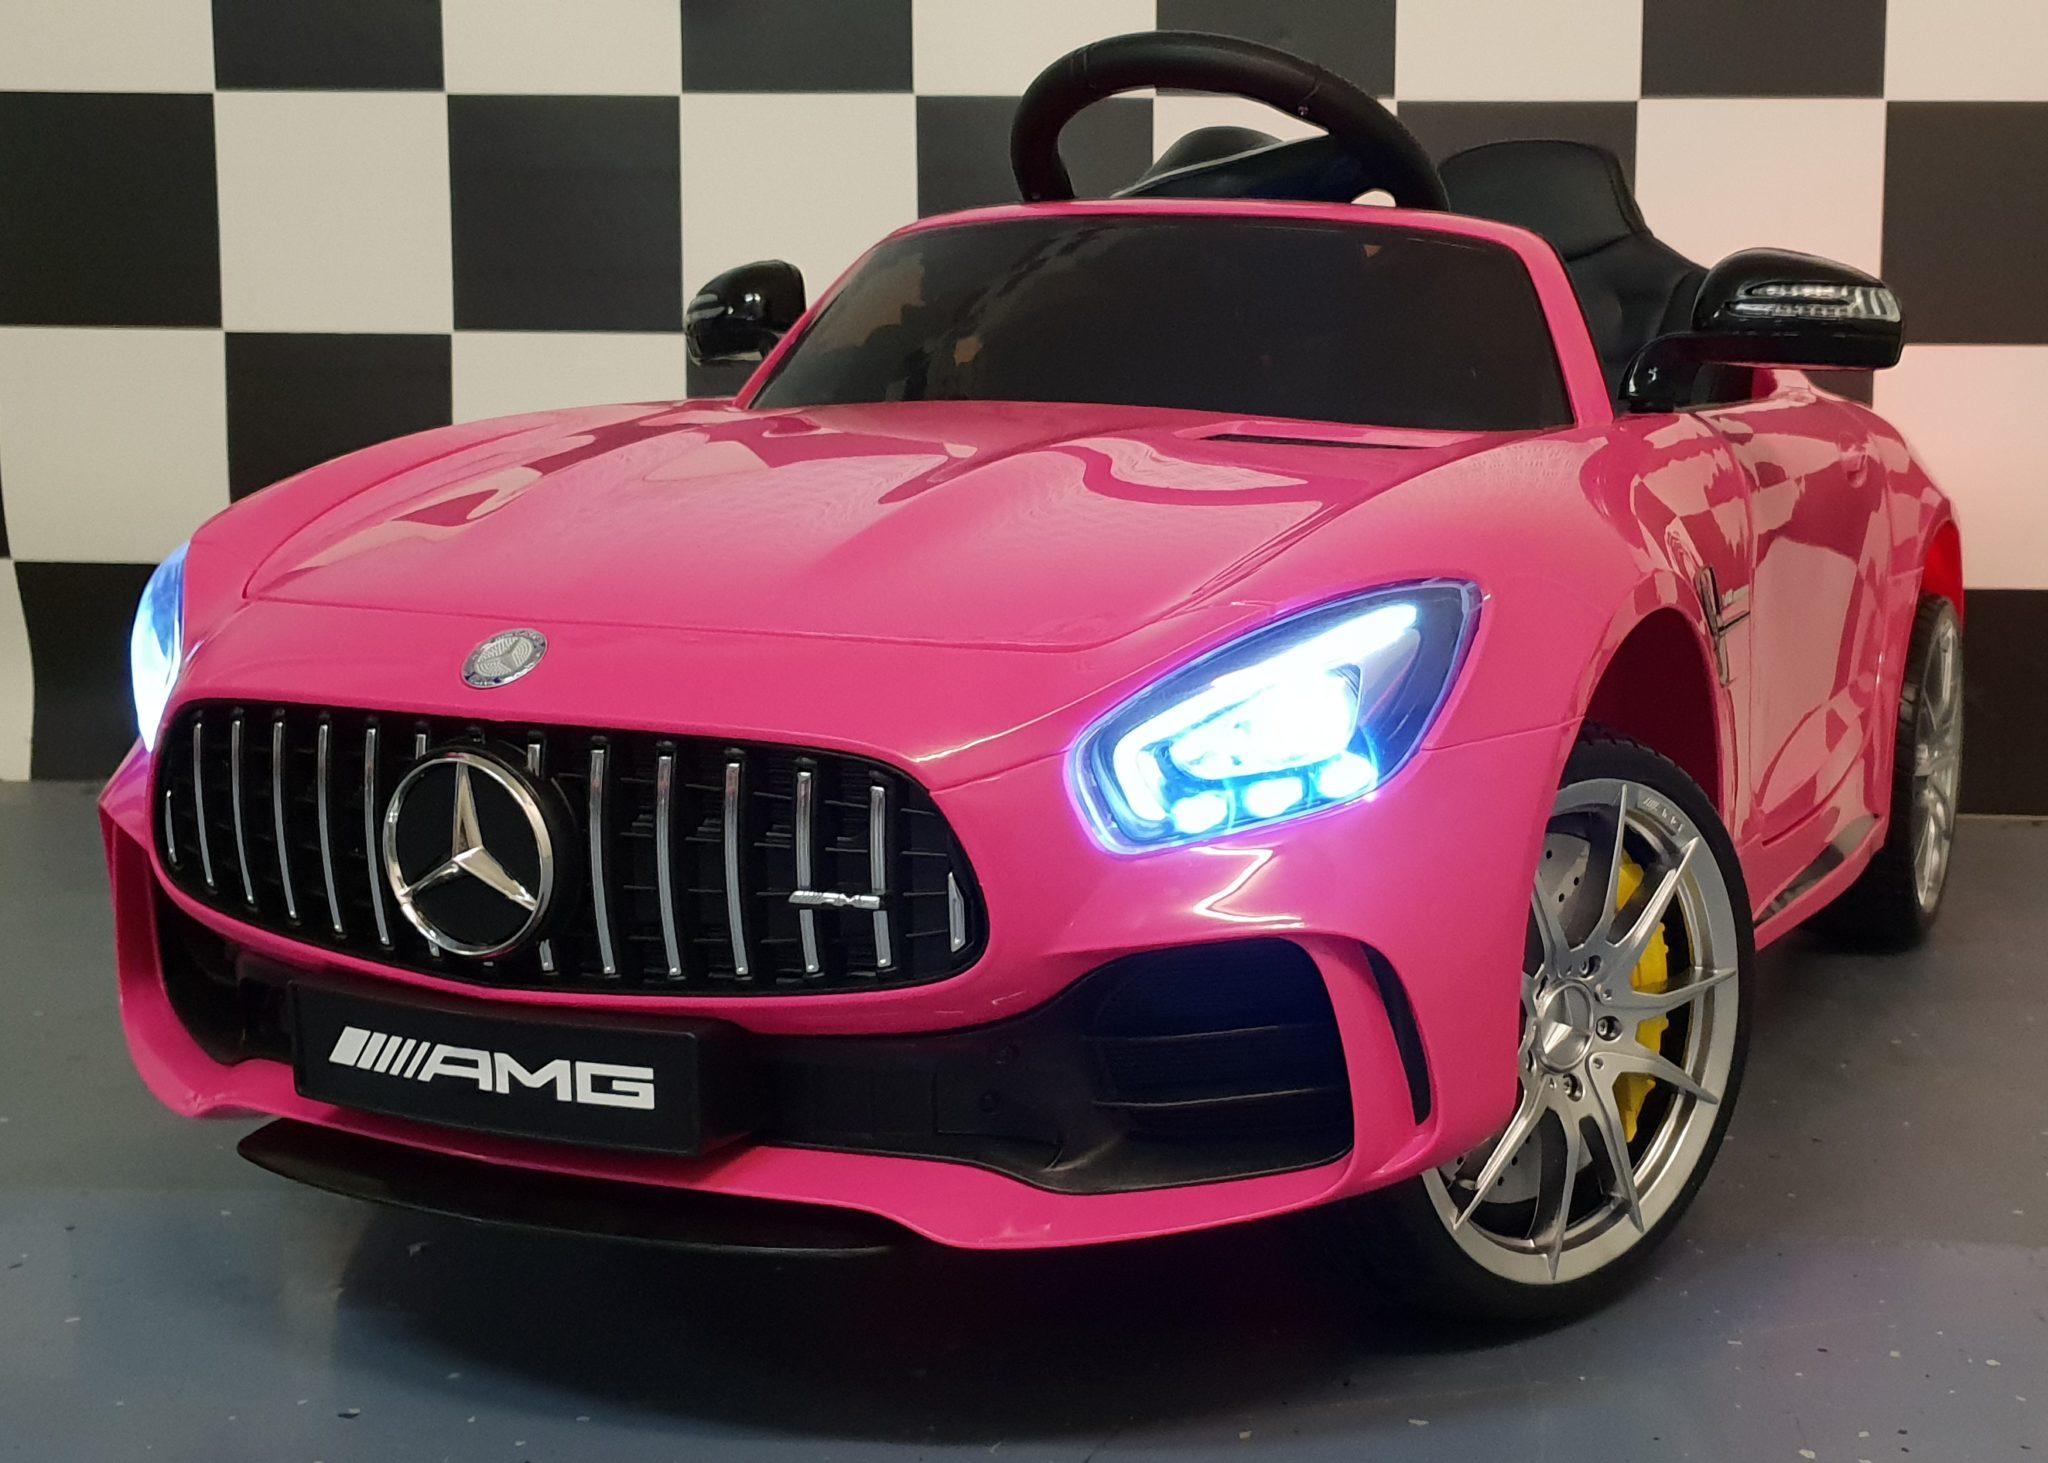 Speelgoed Accu Auto Mercedes Elektrische Auto Met Rc Cars4kids